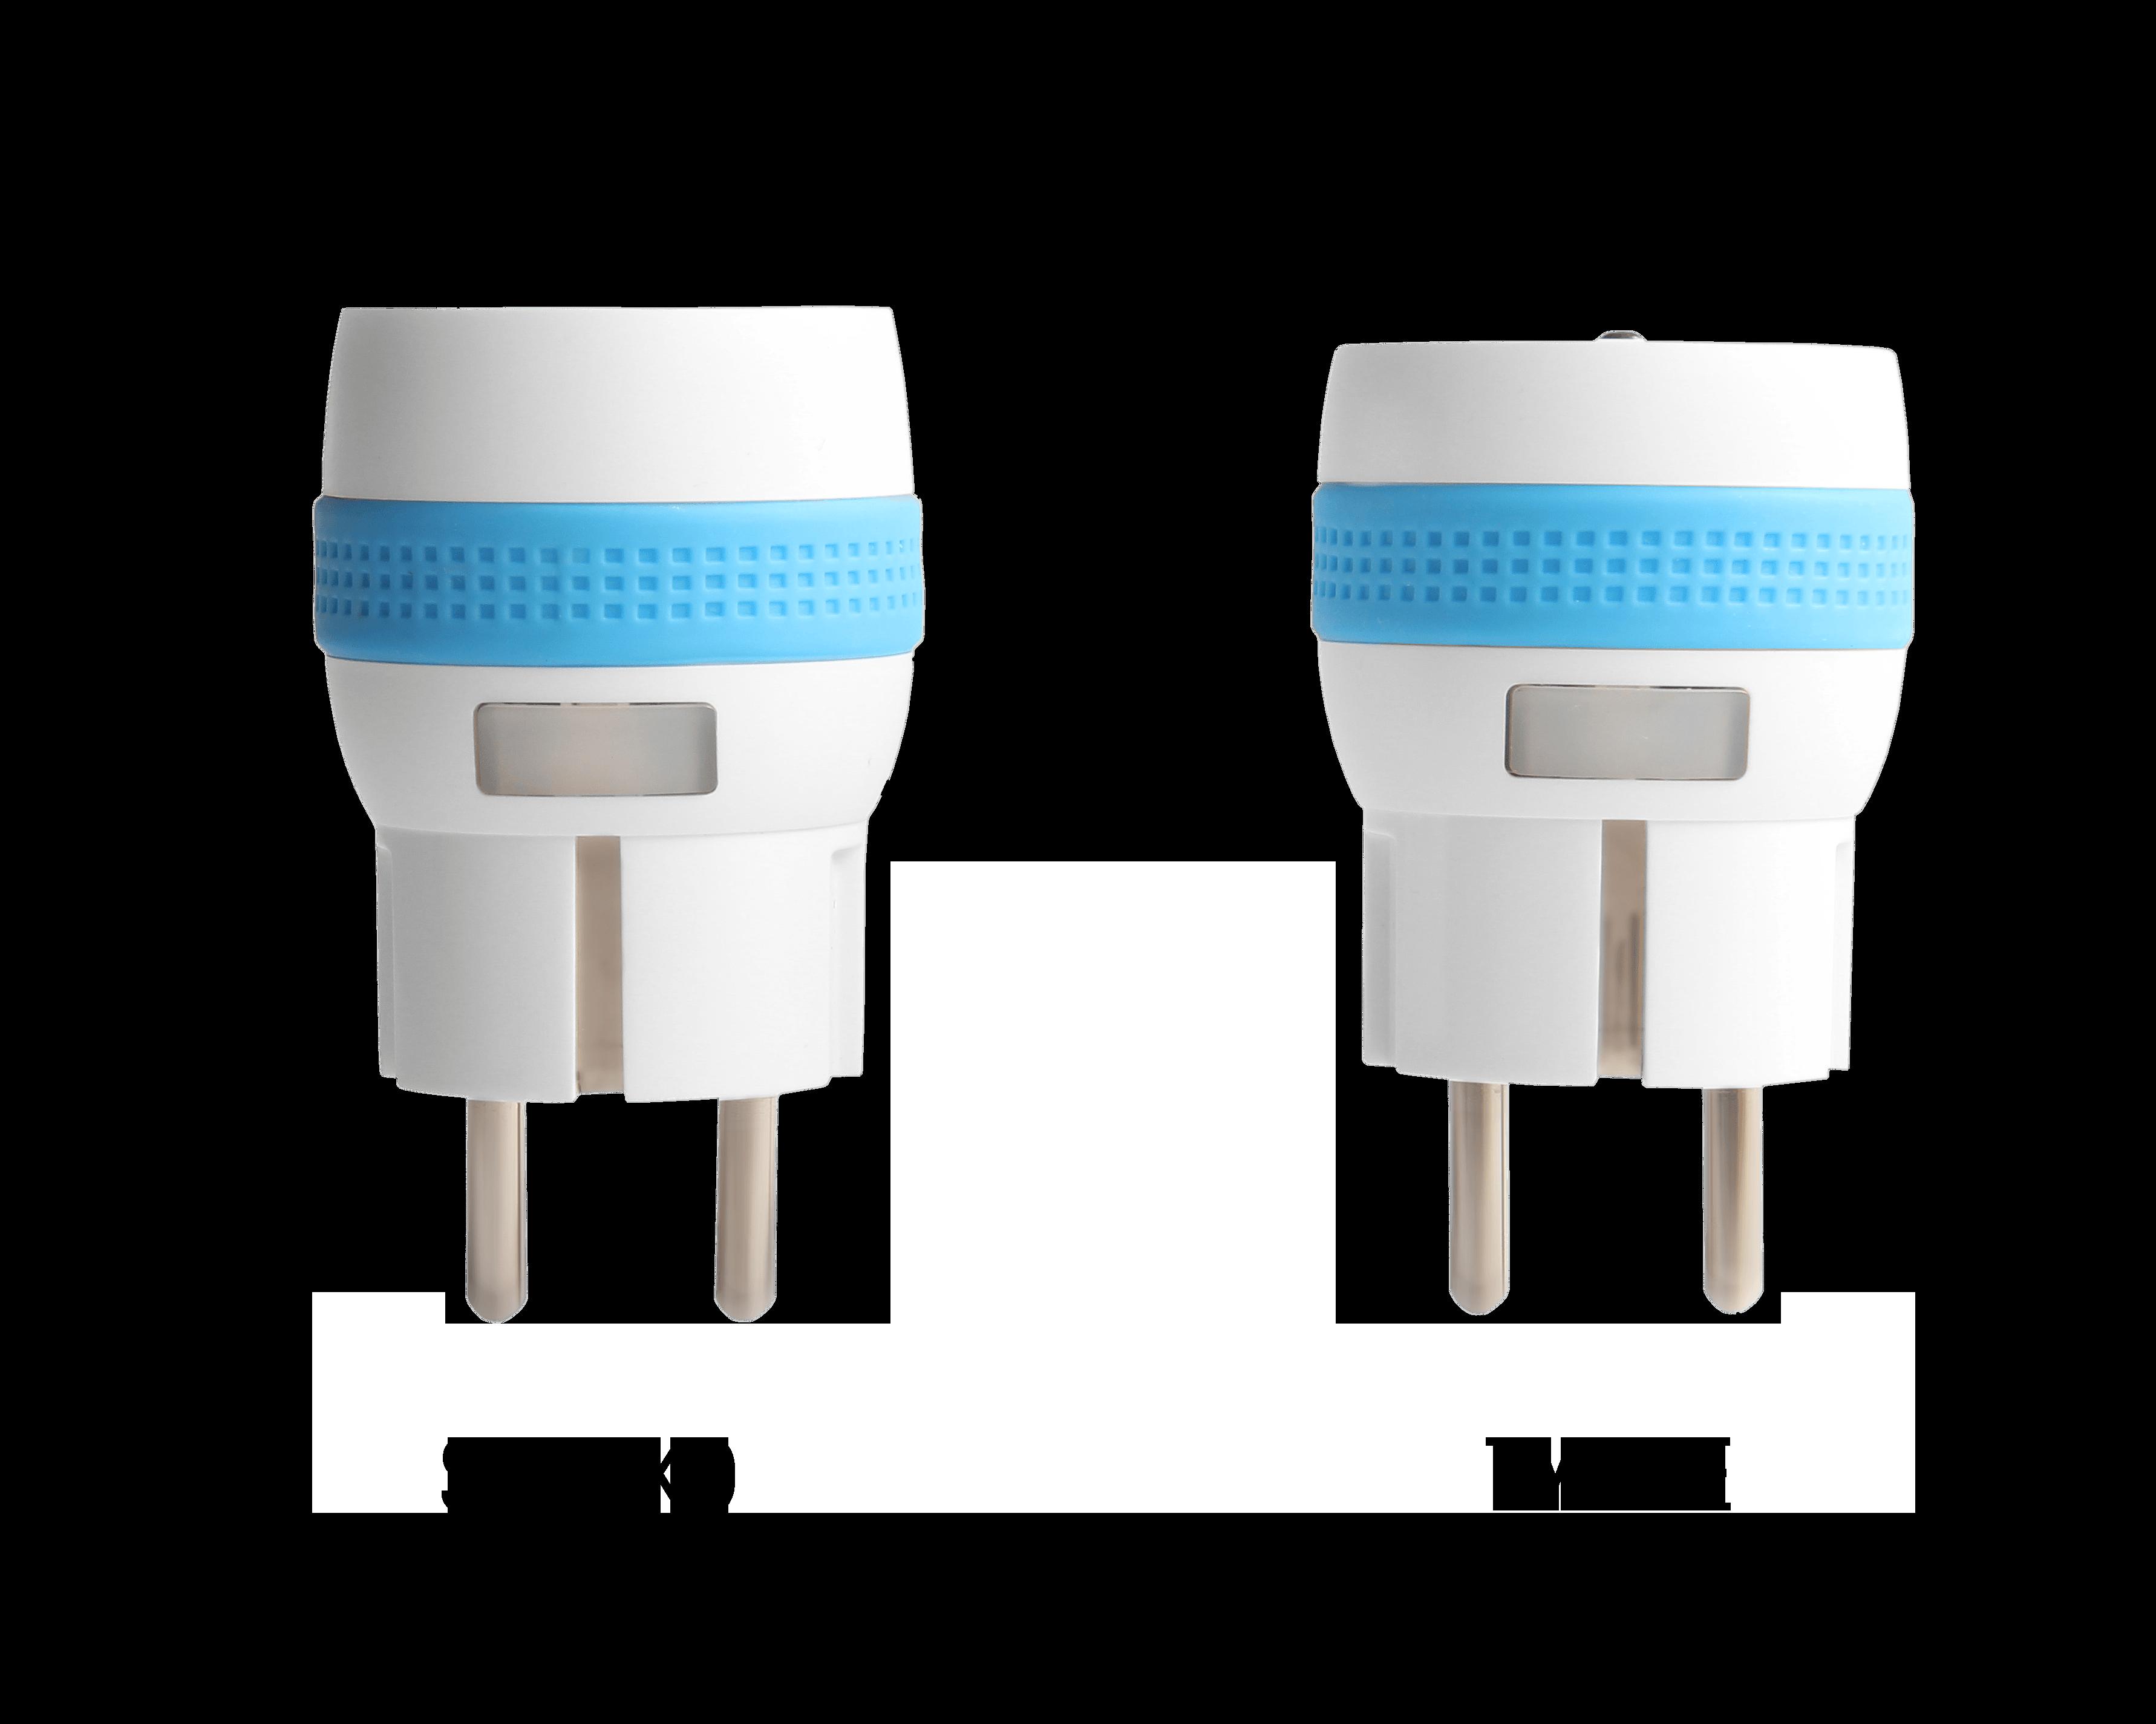 nodon micro smart plug enocean alliance. Black Bedroom Furniture Sets. Home Design Ideas